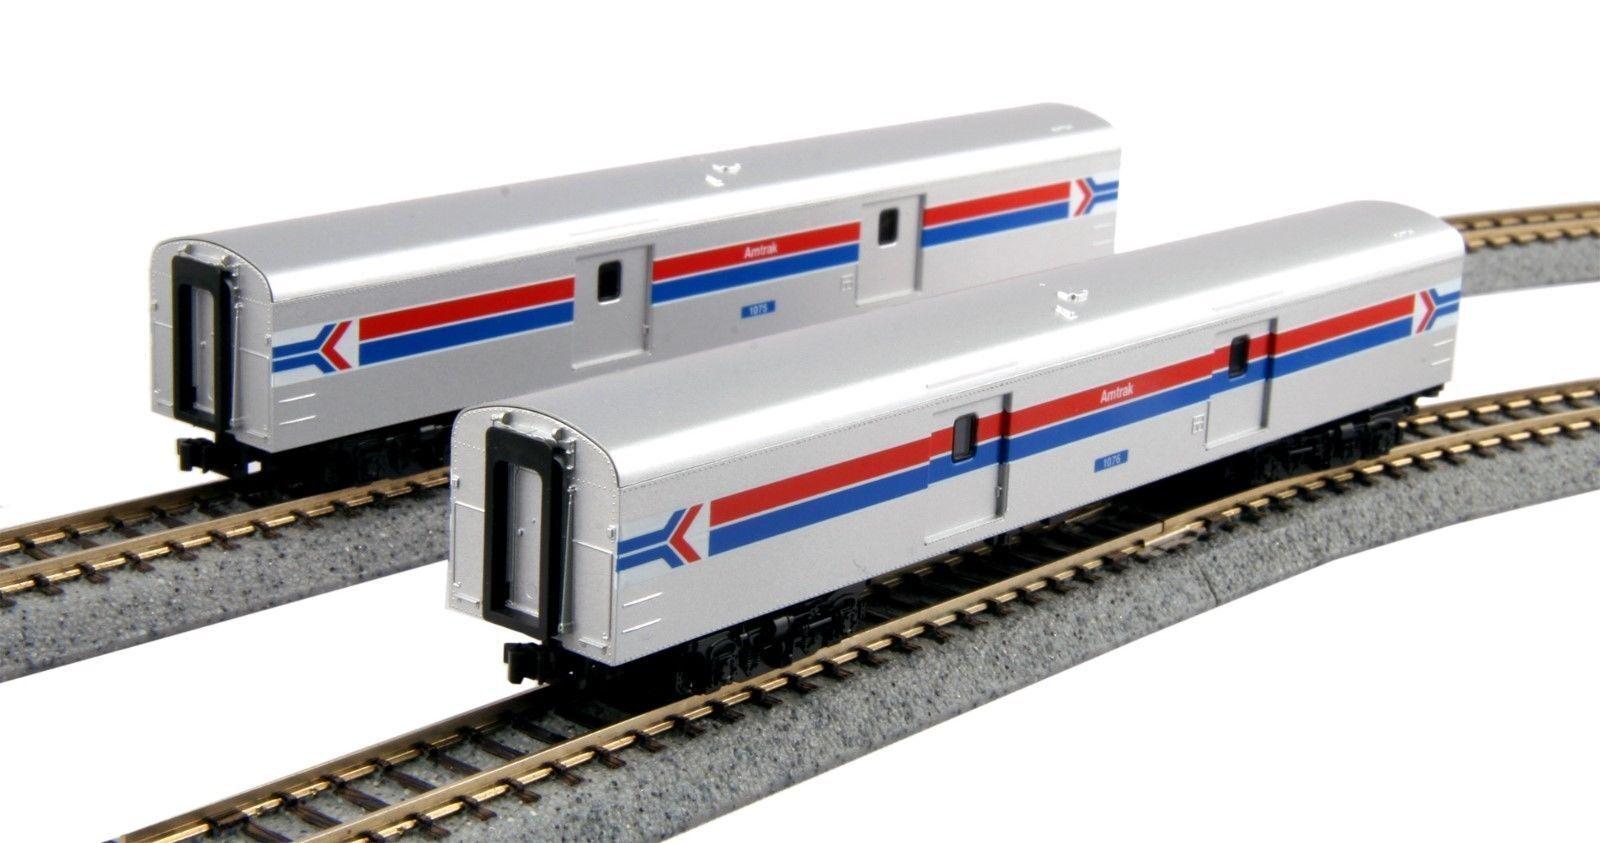 KATO 1063512 N Amtrak Baggage Car Phase I 2 Car Set Road 1076 106-3512 NEW